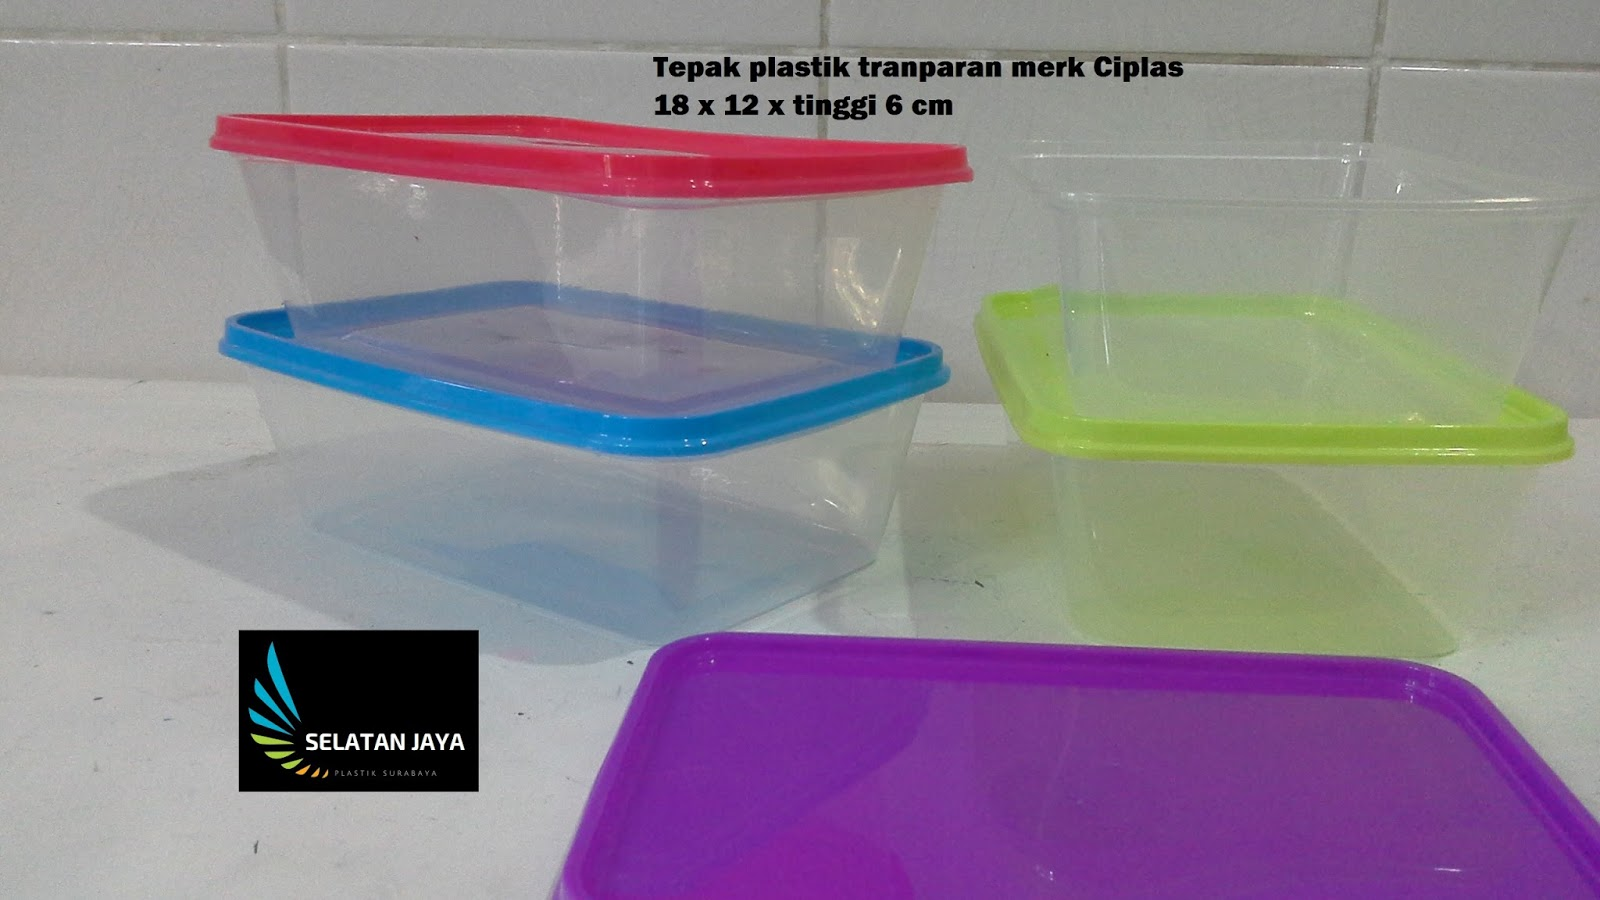 Selatan Jaya Distributor Barang Plastik Furnitur Surabaya Indonesia Lion Star Baskom Kotak Square Basin No 4 Ba 18 Tepak Transparan